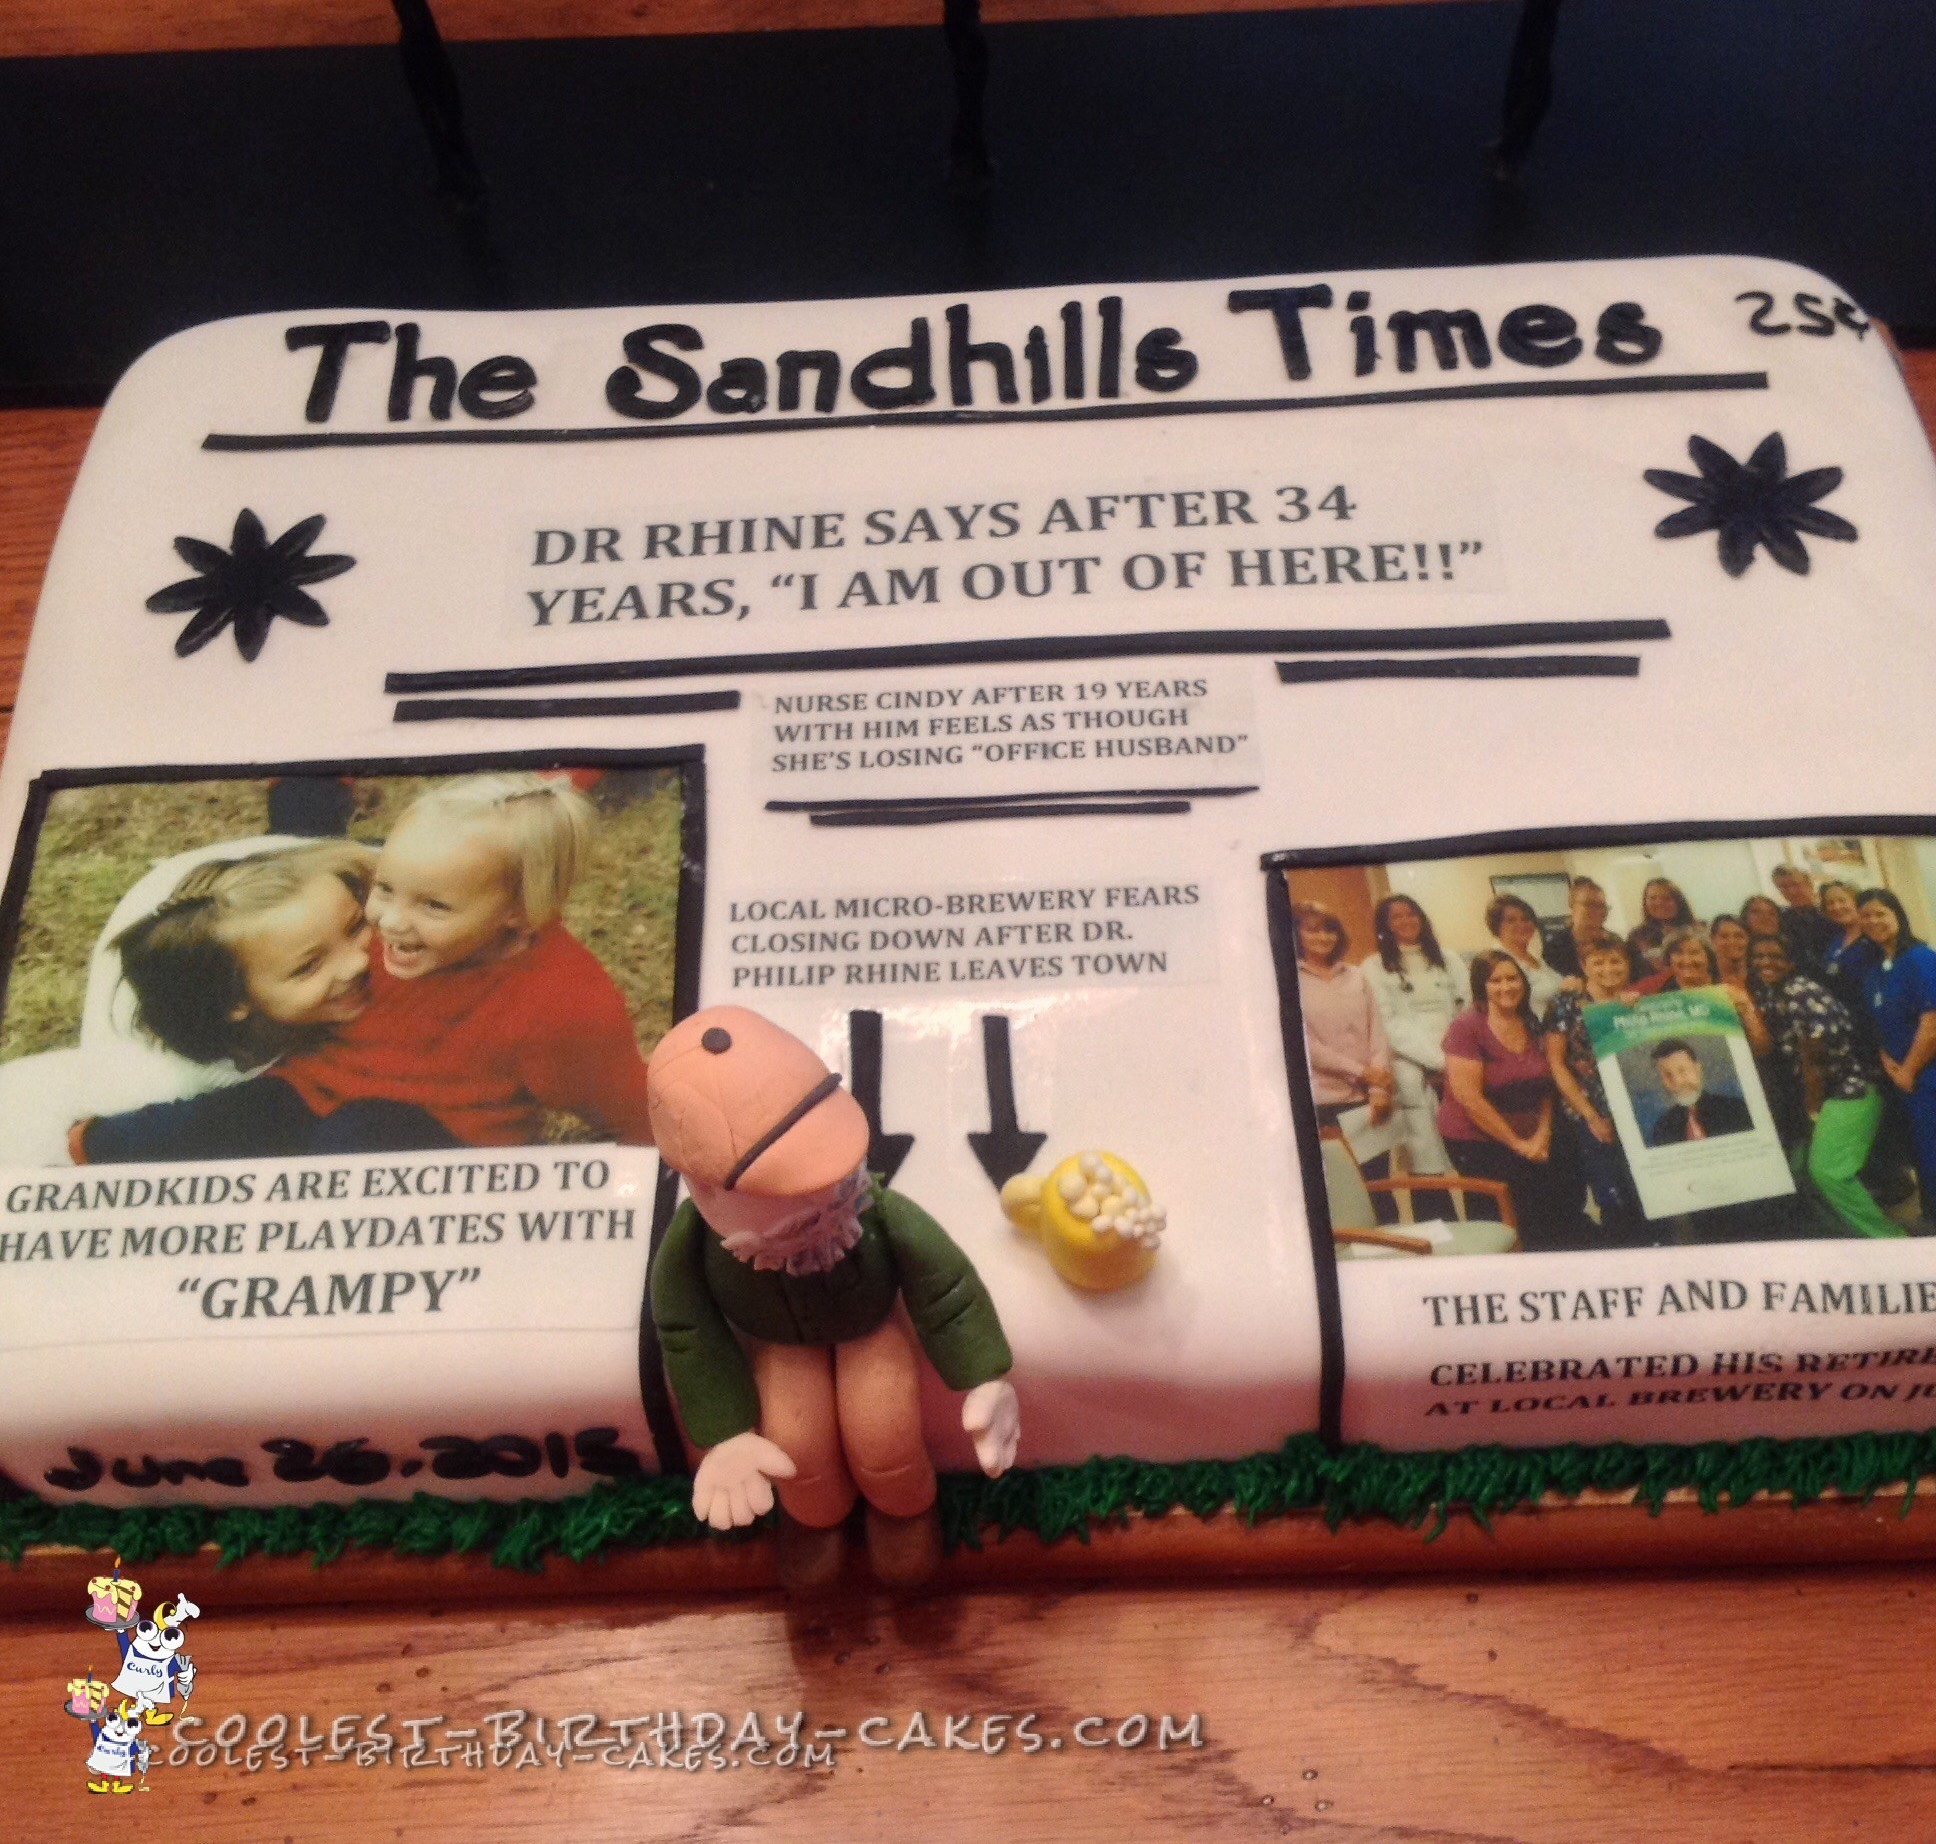 Coolest Retirement Cake